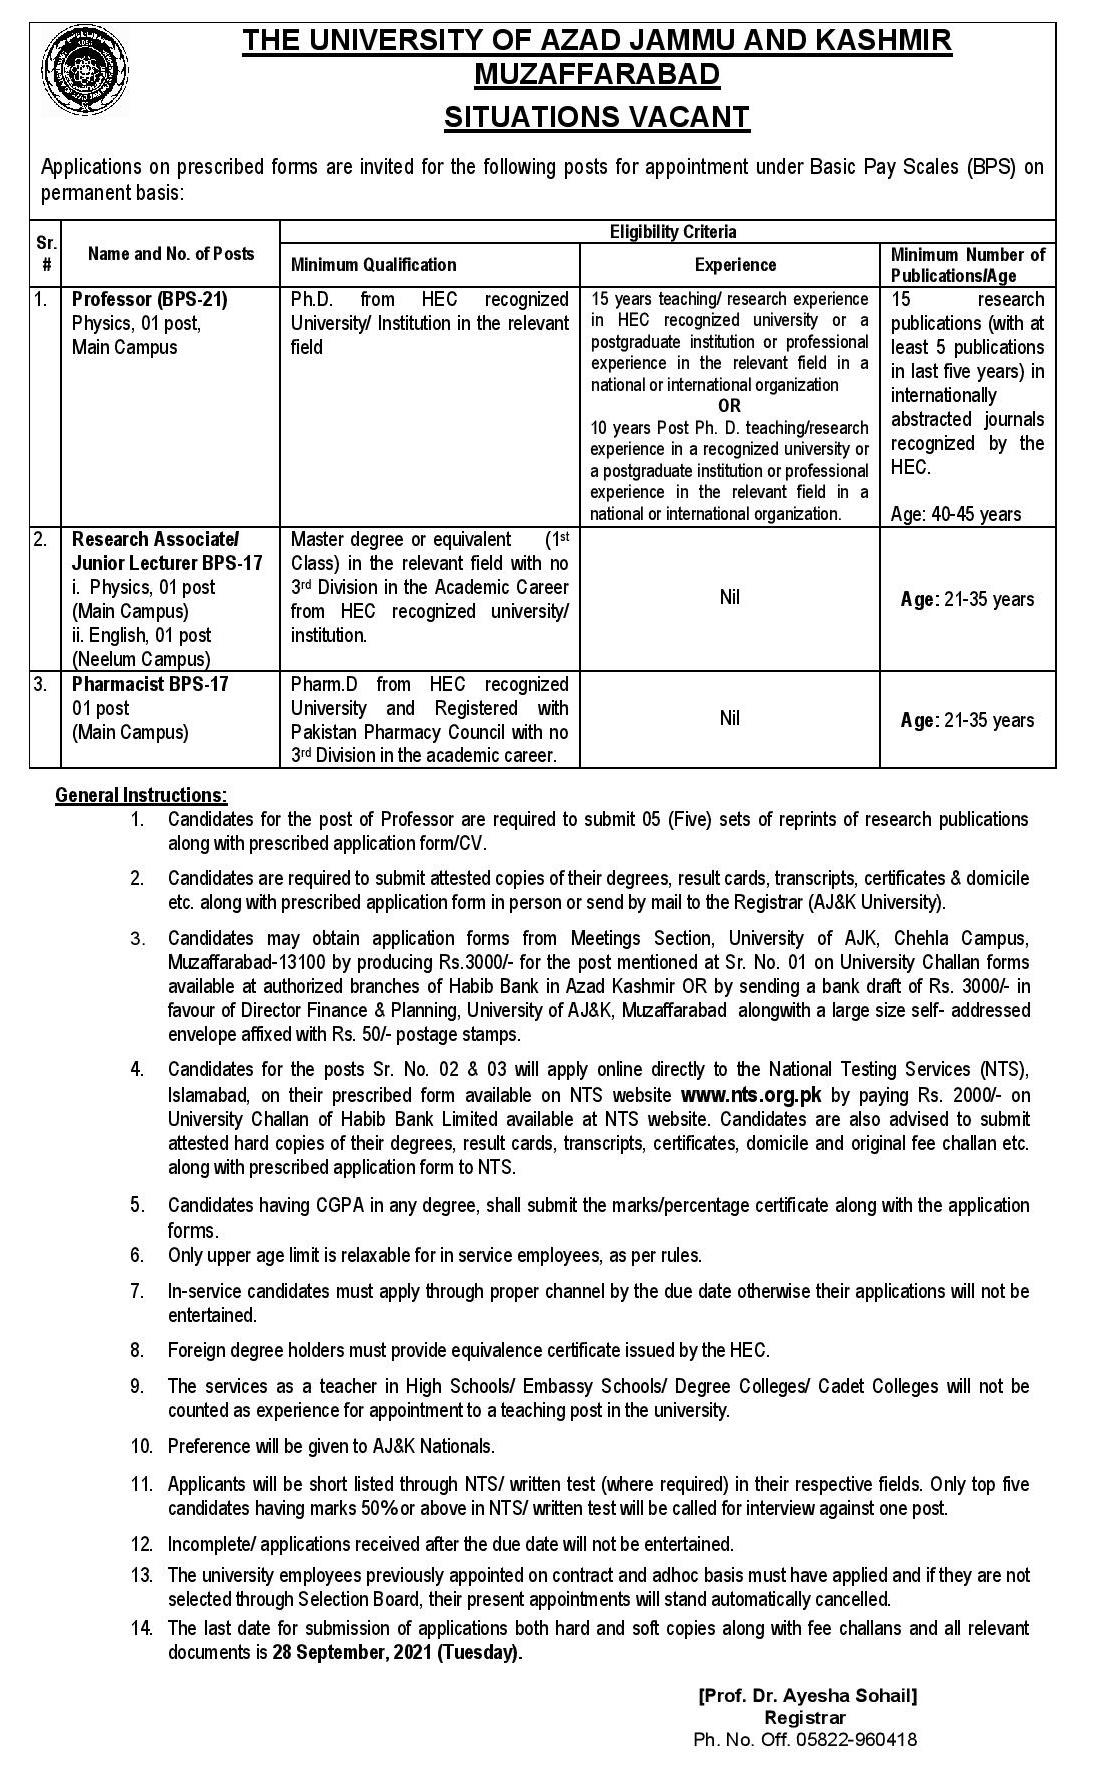 AJK University Muzaffarabad Jobs